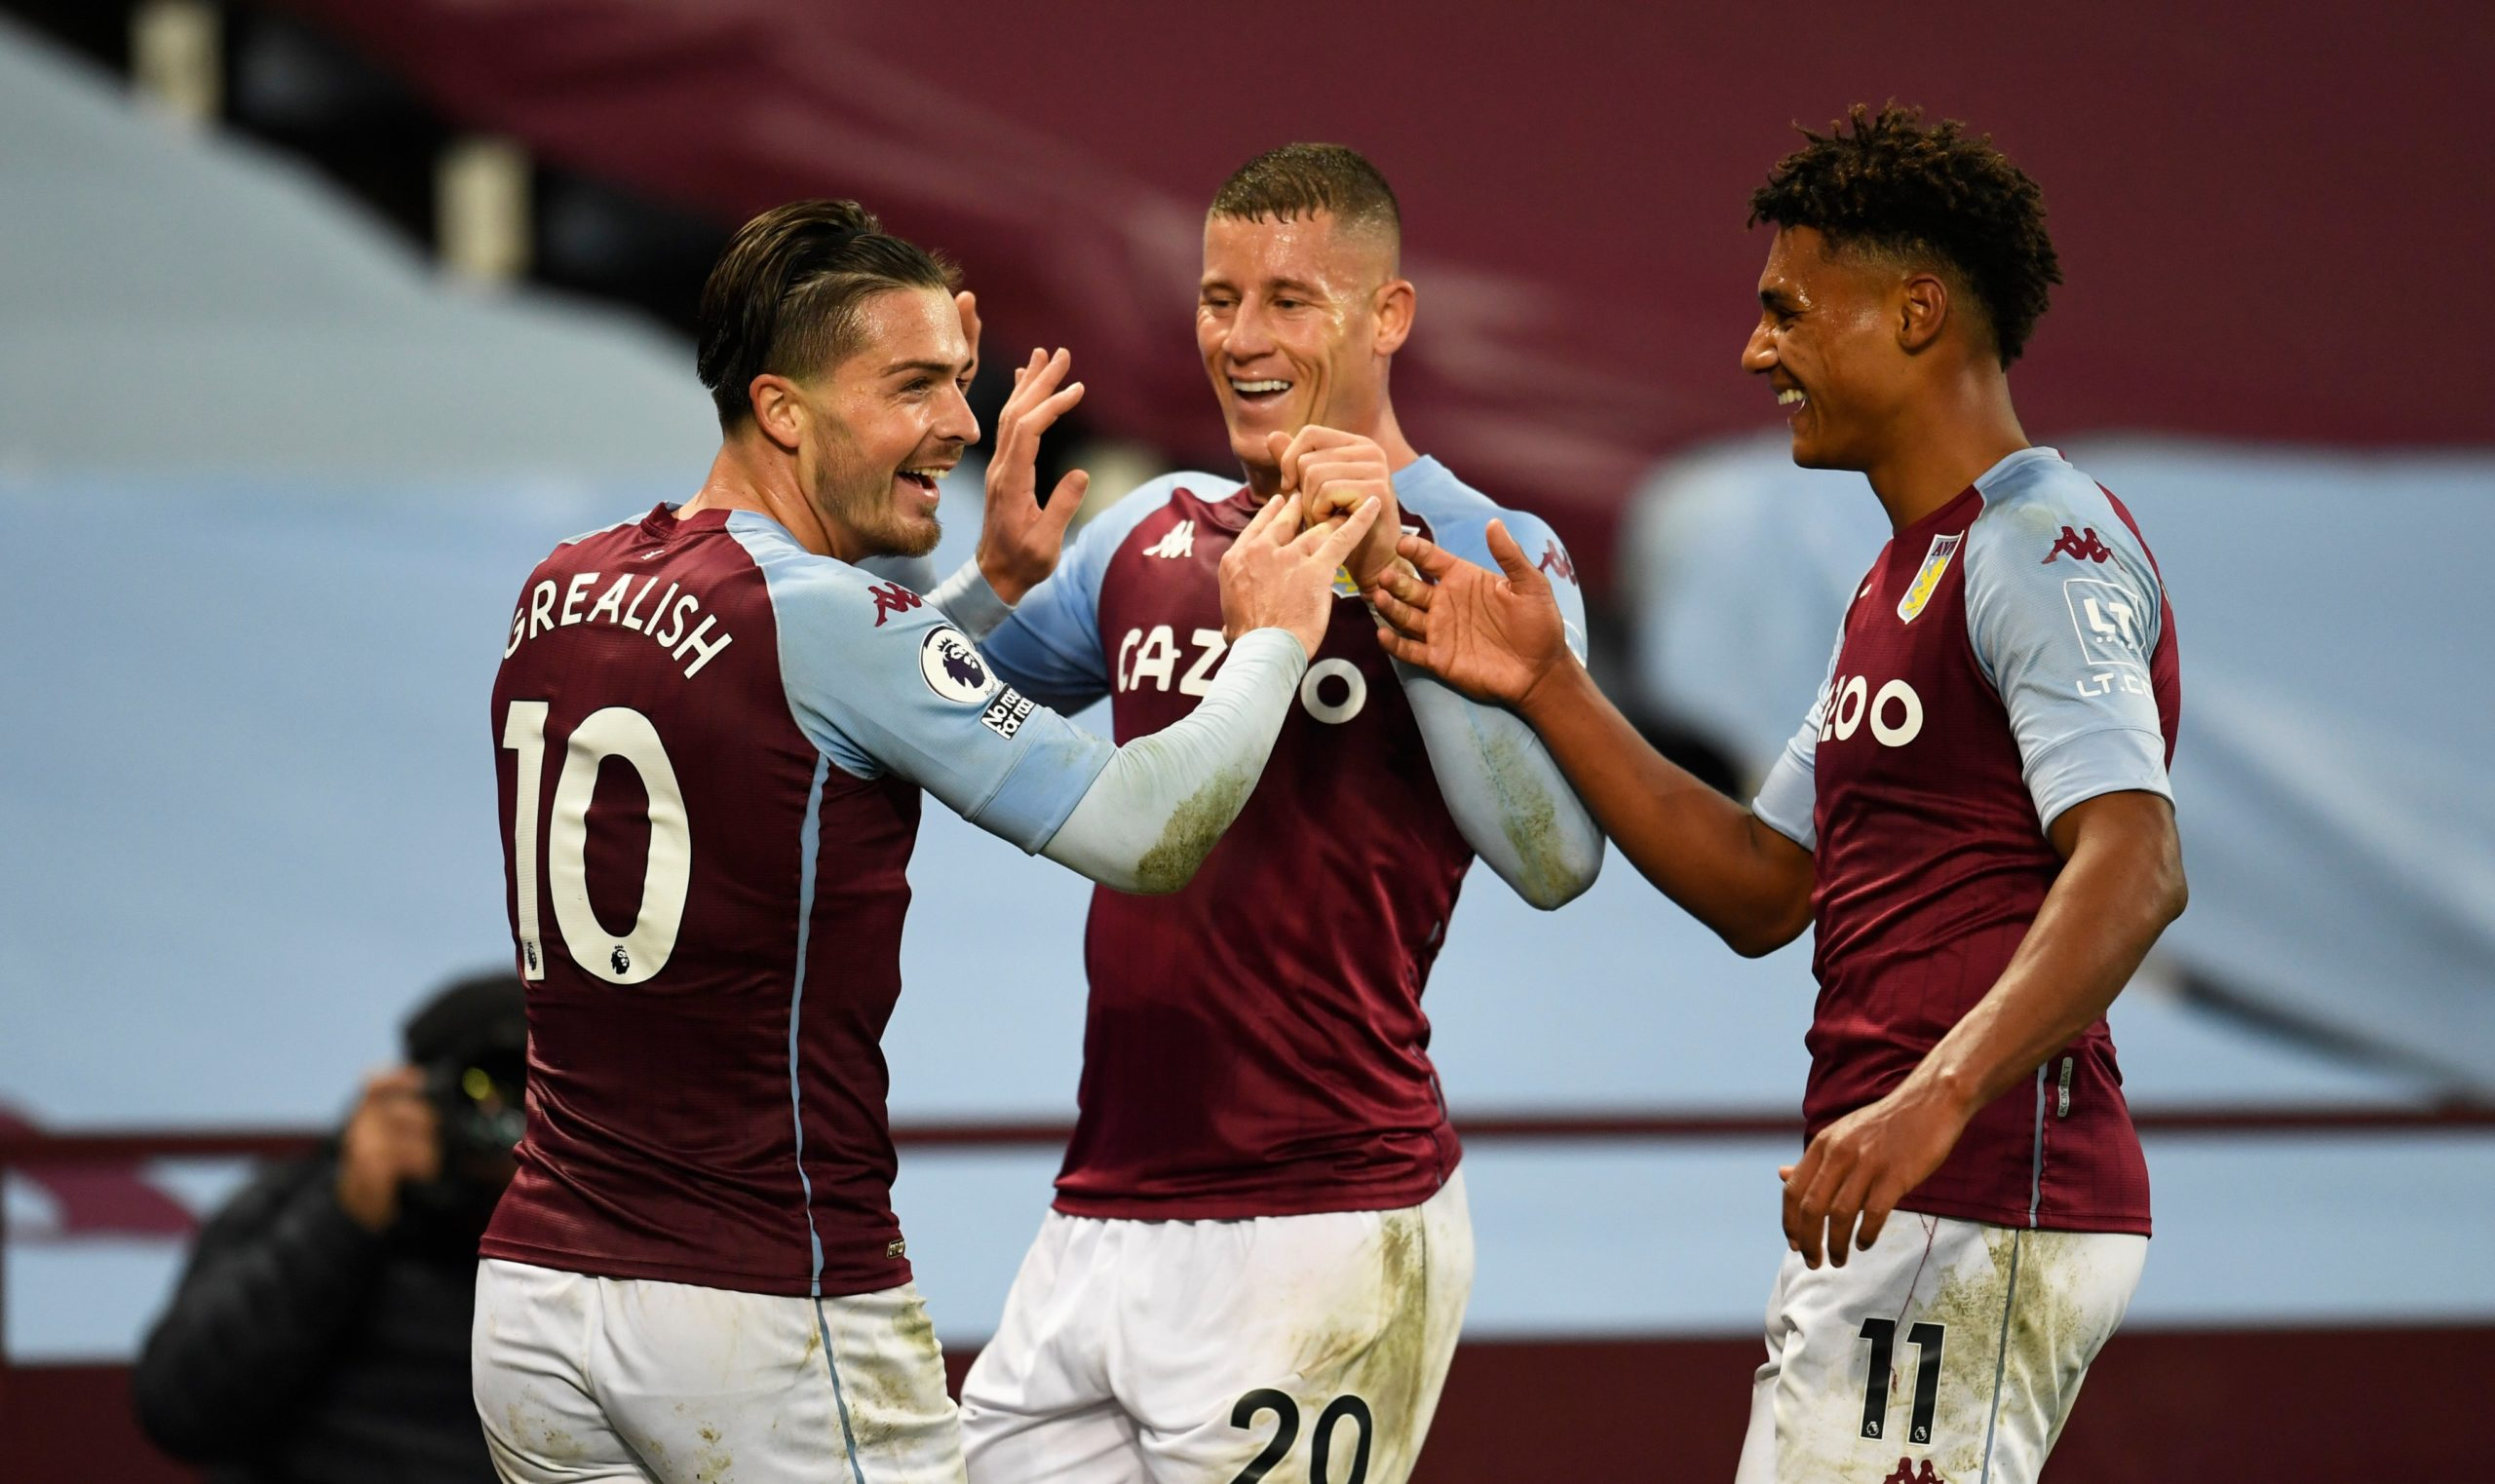 Premier League Roundup 2020/21: Gameweek 4